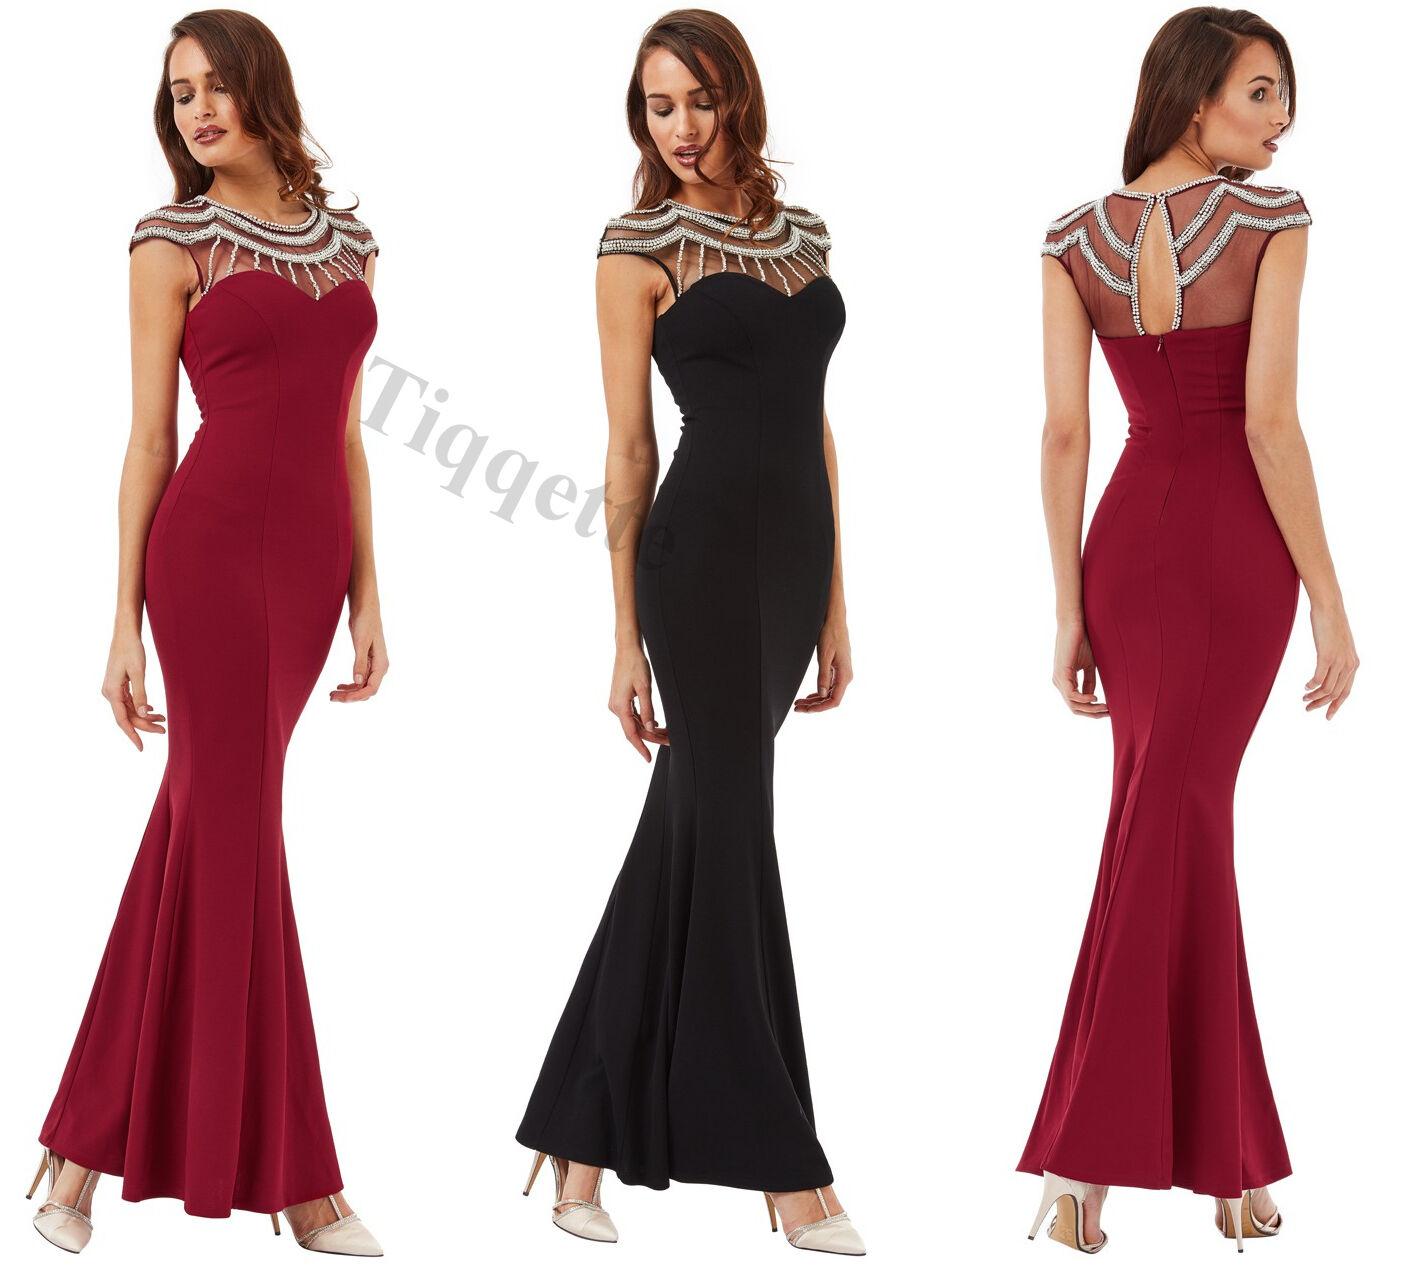 1c11fa10a80 Goddiva Embellished Maxi Dress in Colours Fishtail Great nhlrvy19699-Dresses